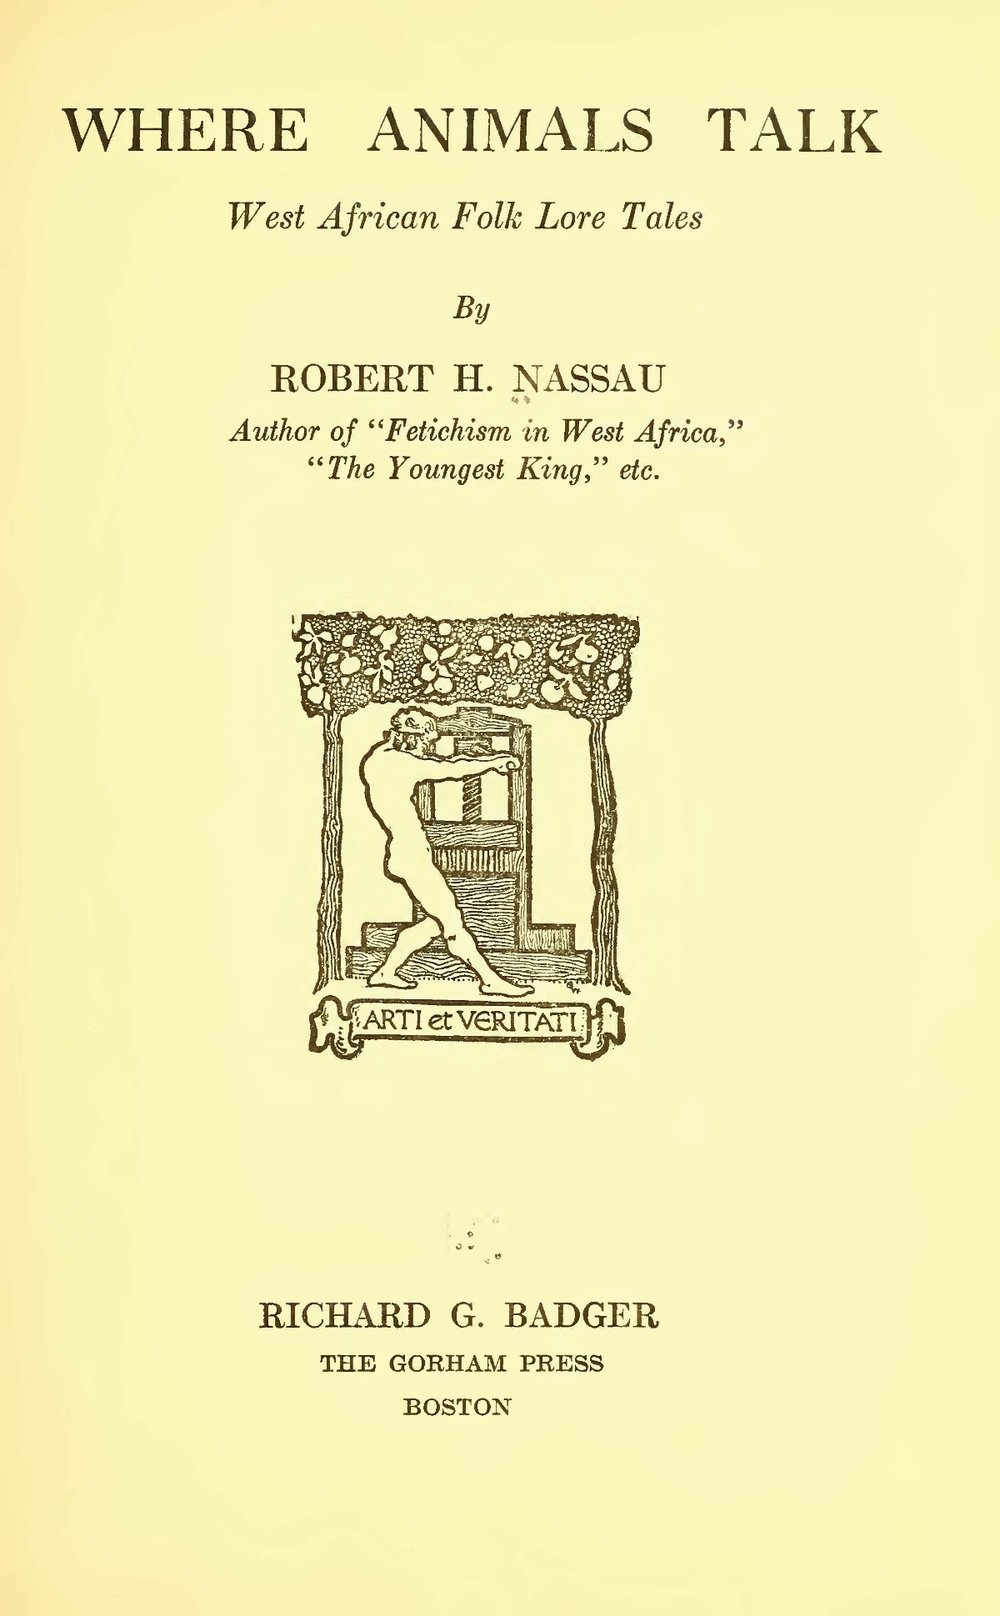 Nassau, Robert Hamill, Where Animals Talk Title Page.jpg